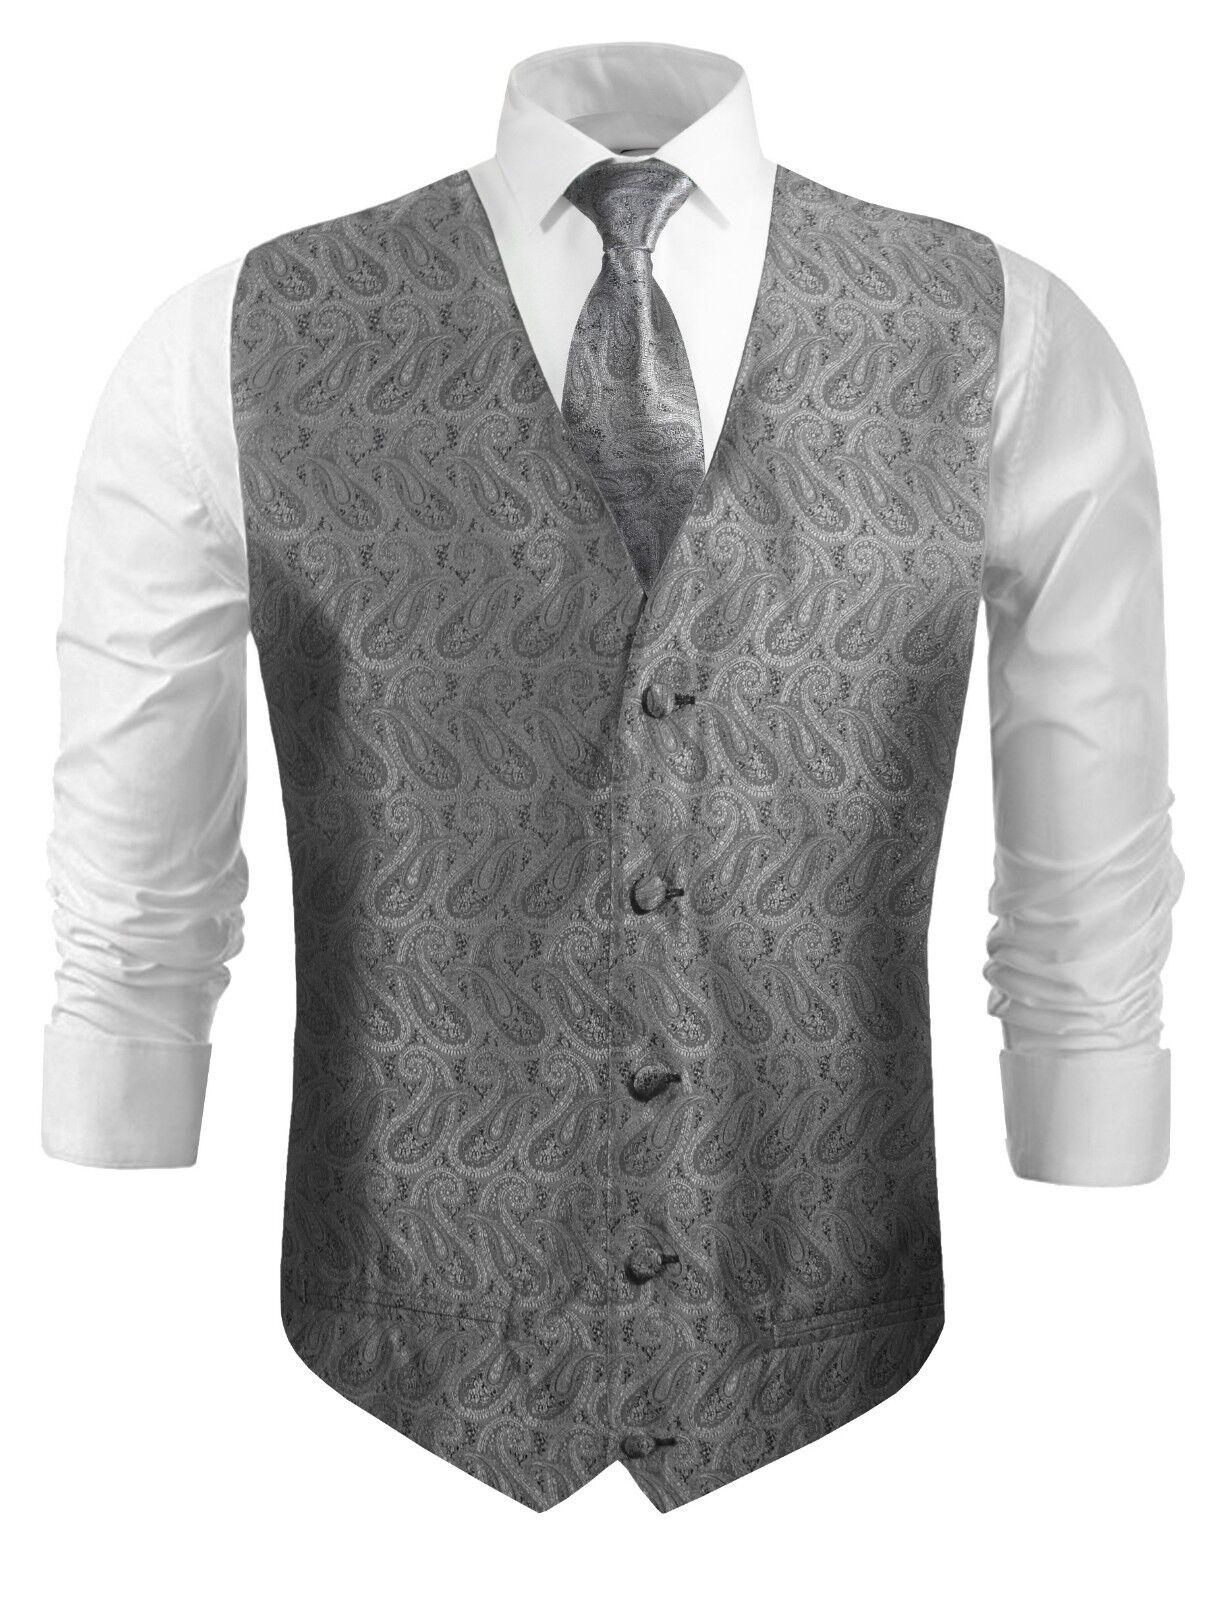 Paul Malone Hochzeitsweste mit Krawatte schwarz silber grau paisley v30